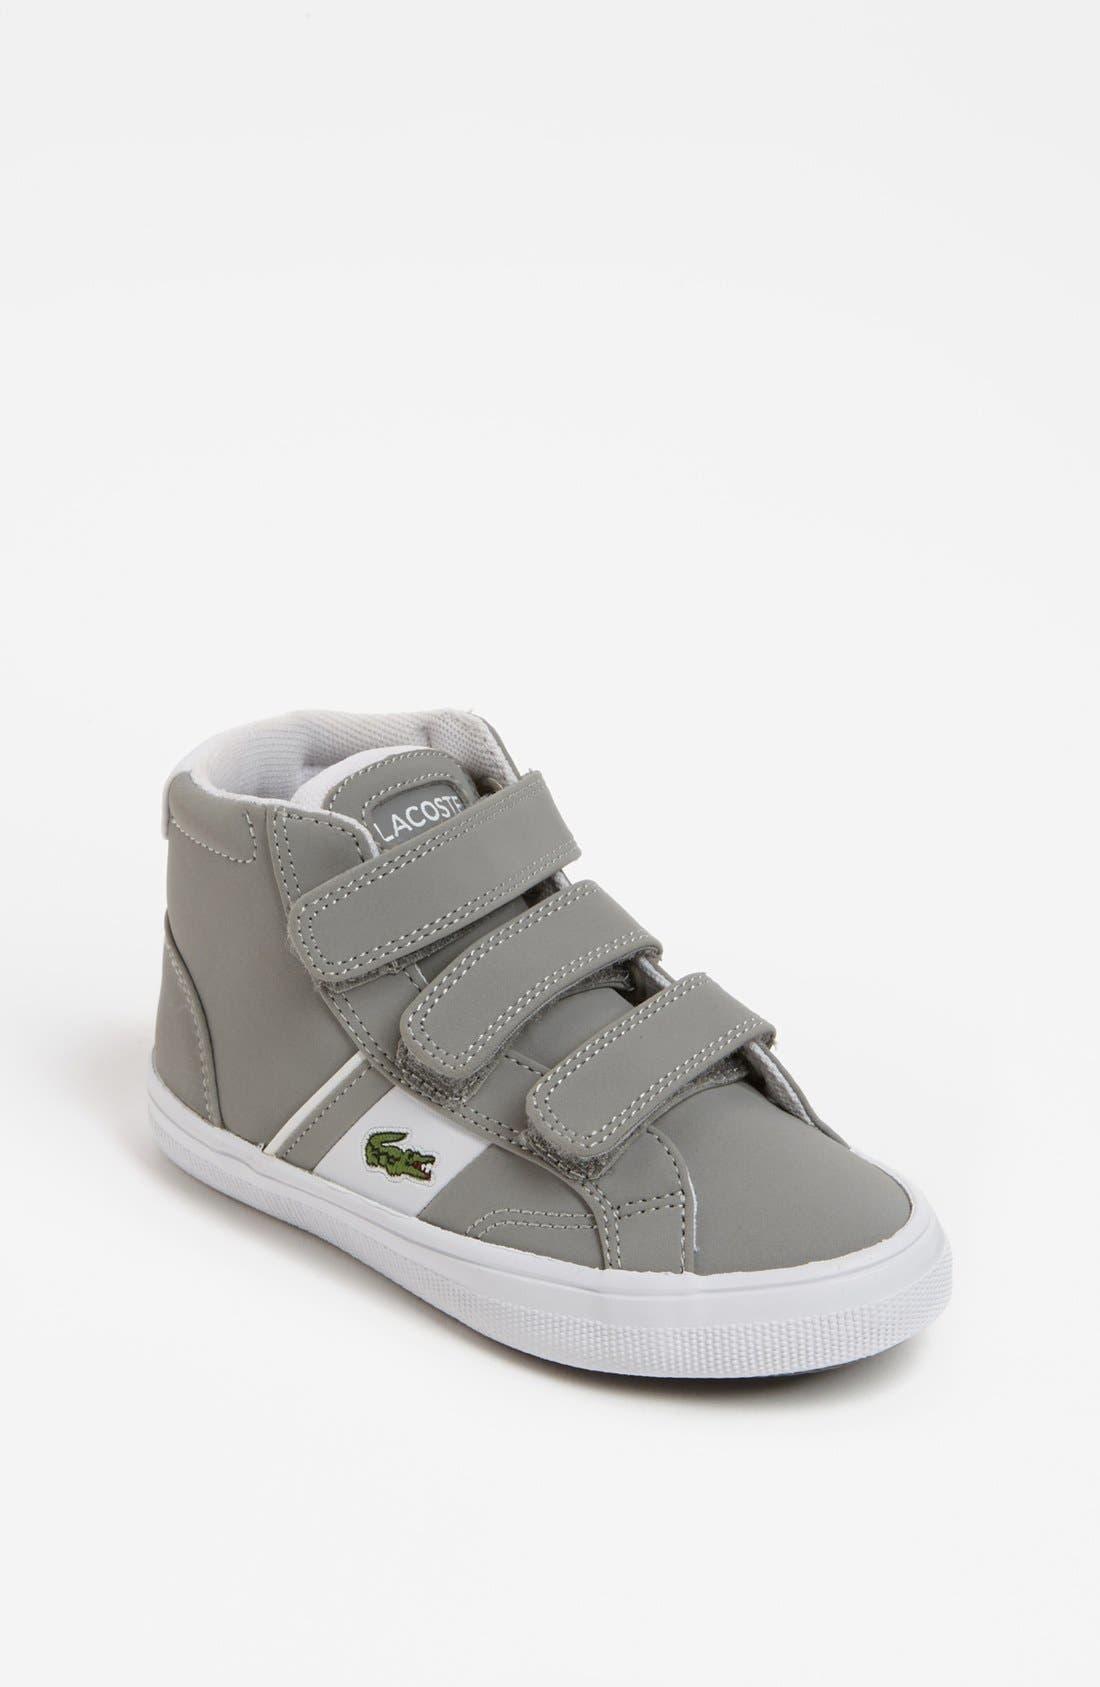 Main Image - Lacoste 'Fairlead' Mid Sneaker (Toddler)